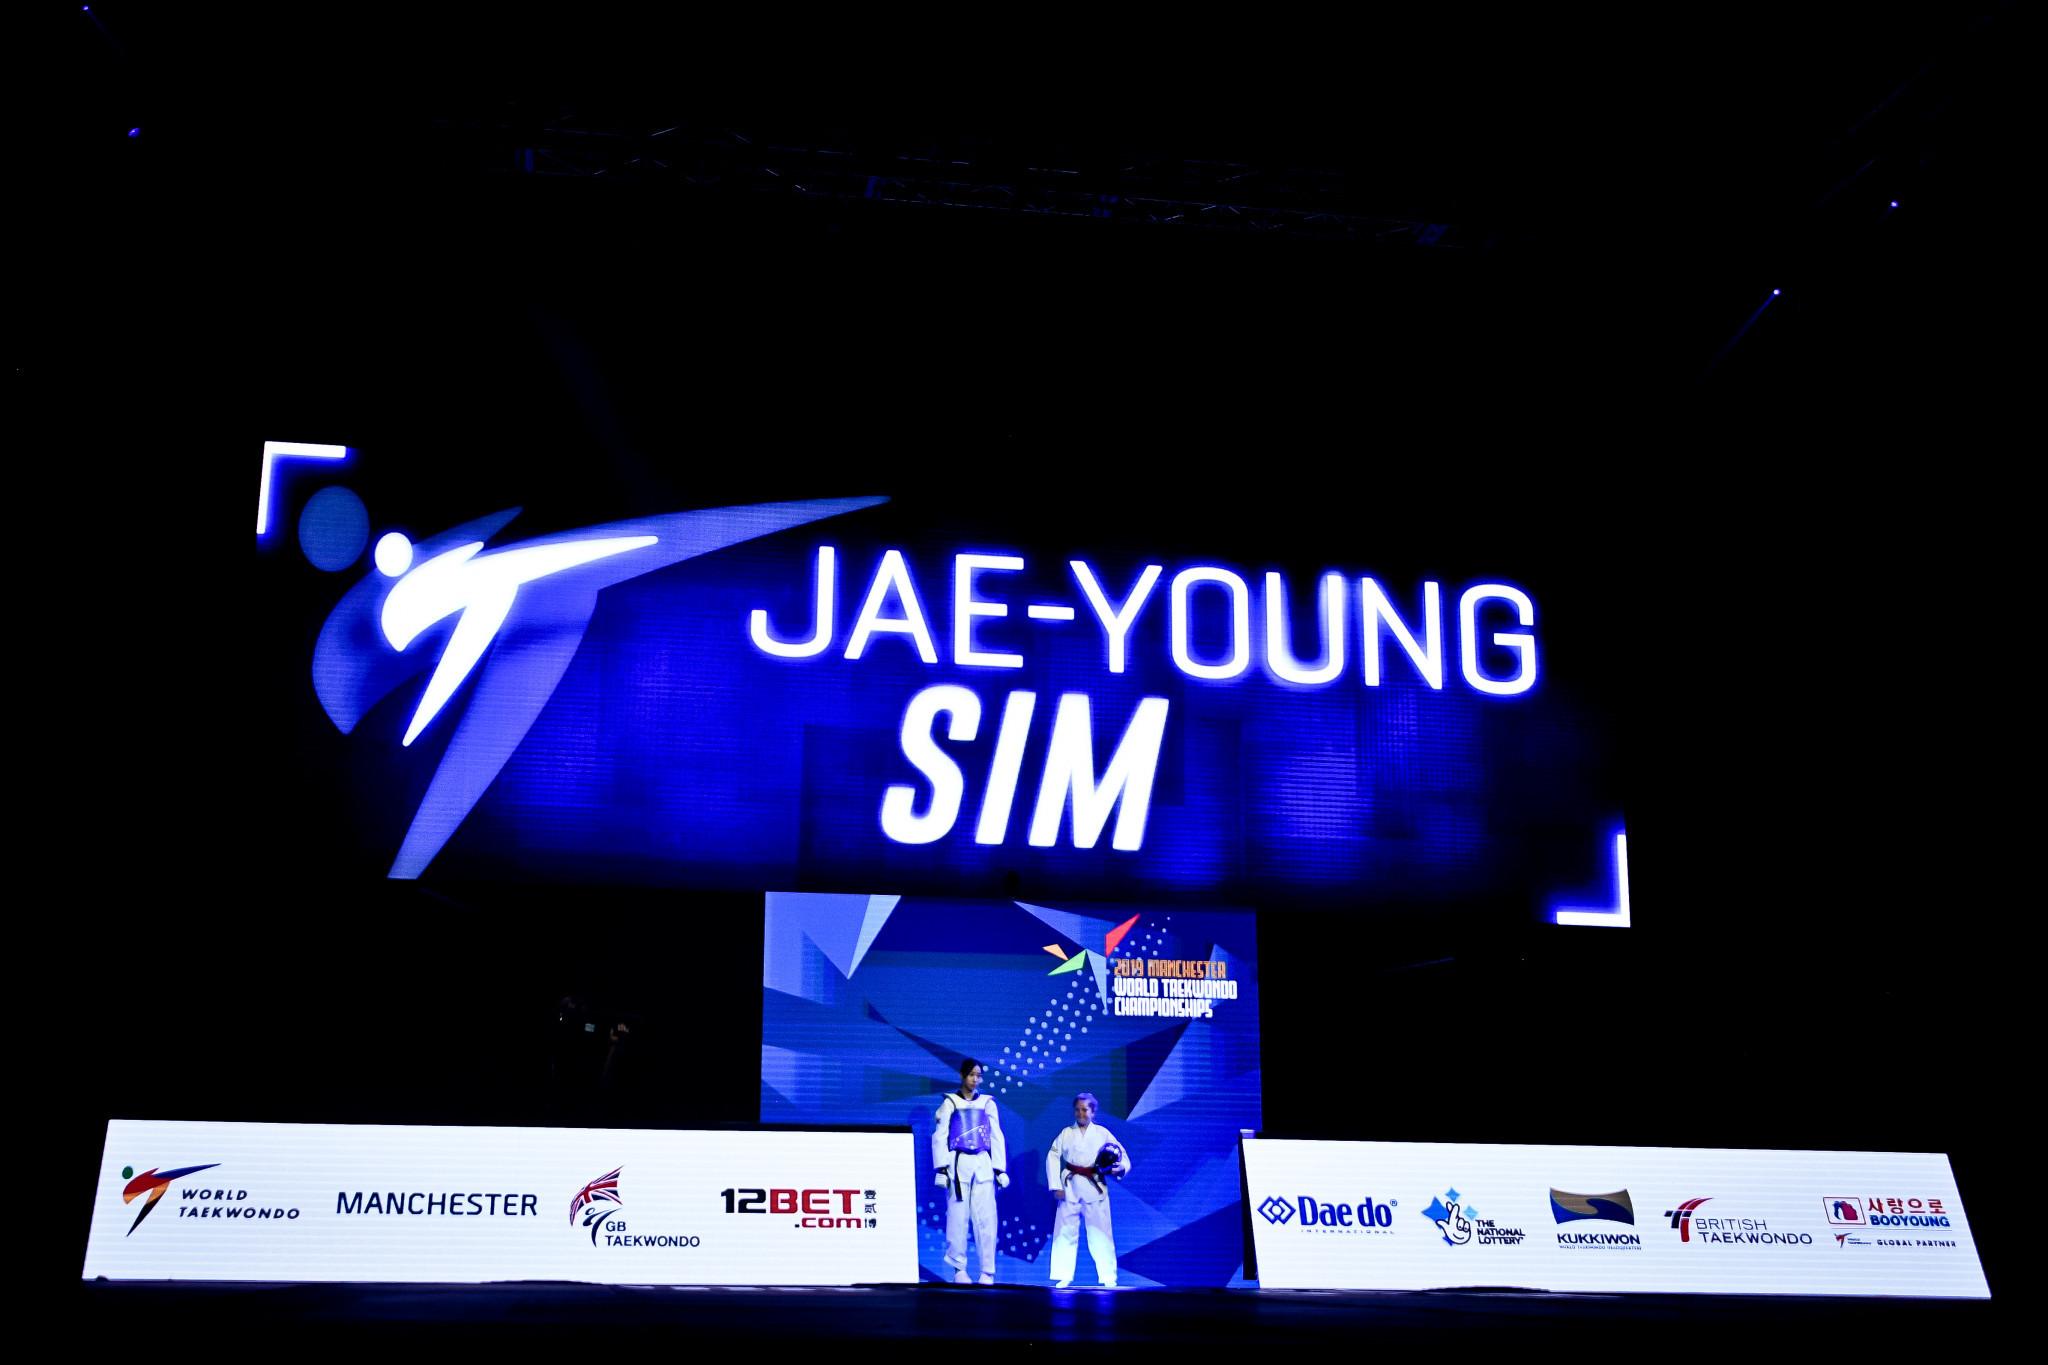 Sim retains title as South Korea claim three gold medals at World Taekwondo Championships